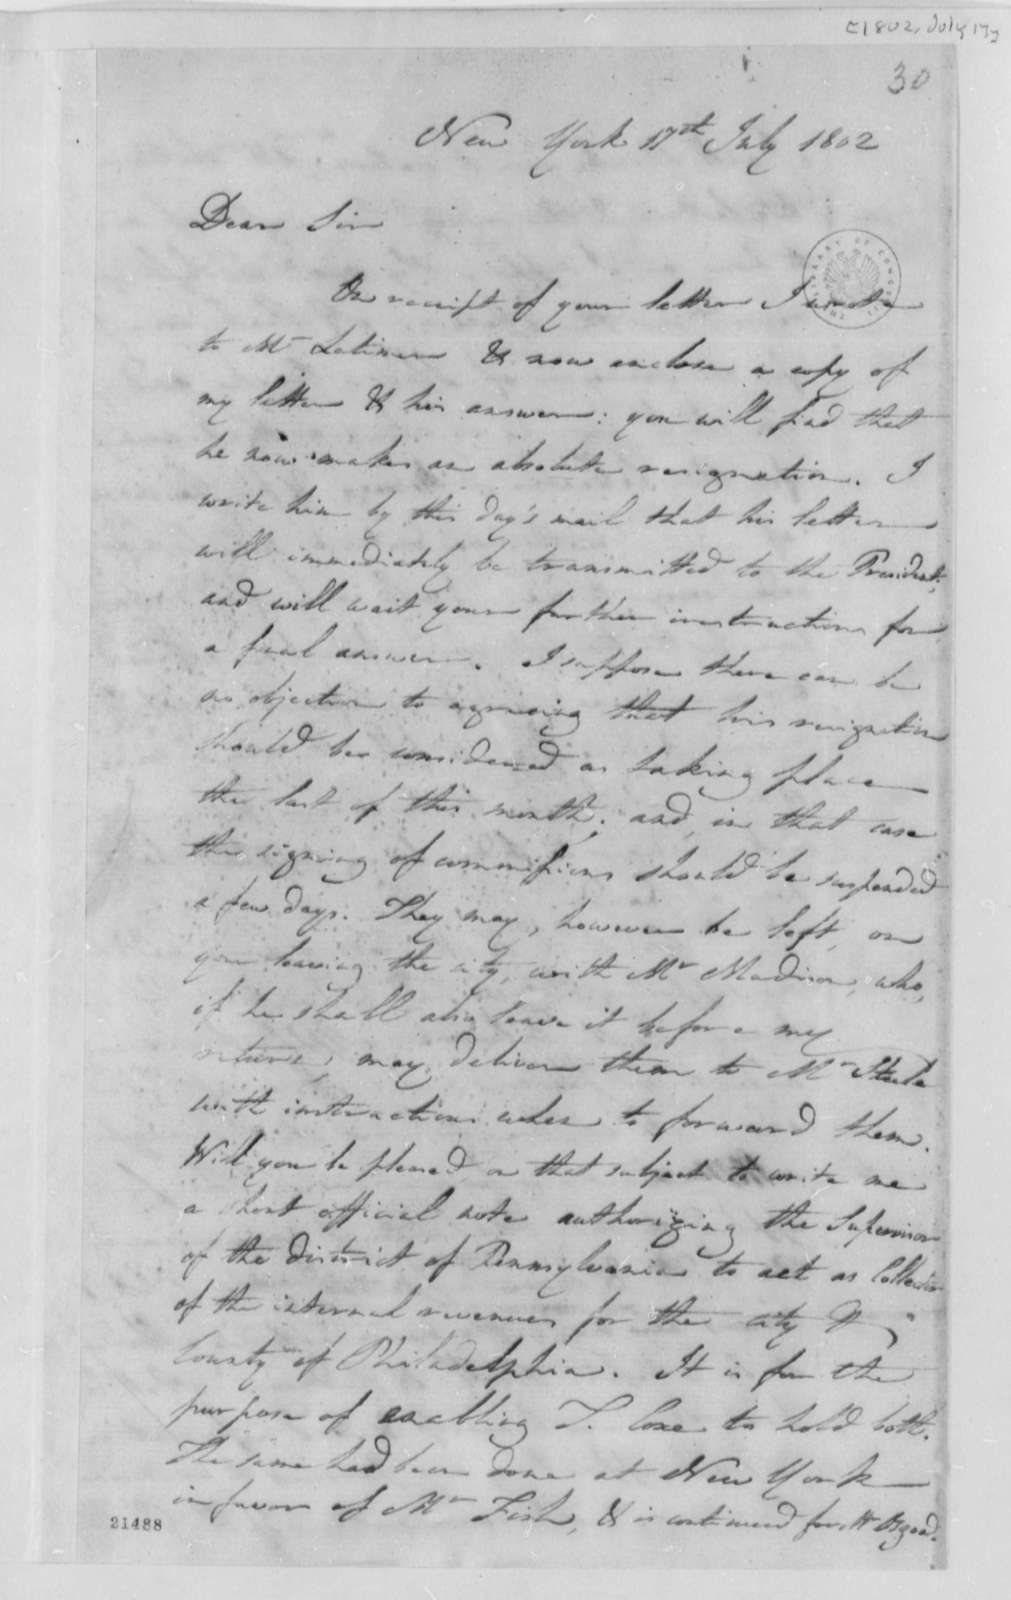 Albert Gallatin to Thomas Jefferson, July 17, 1802